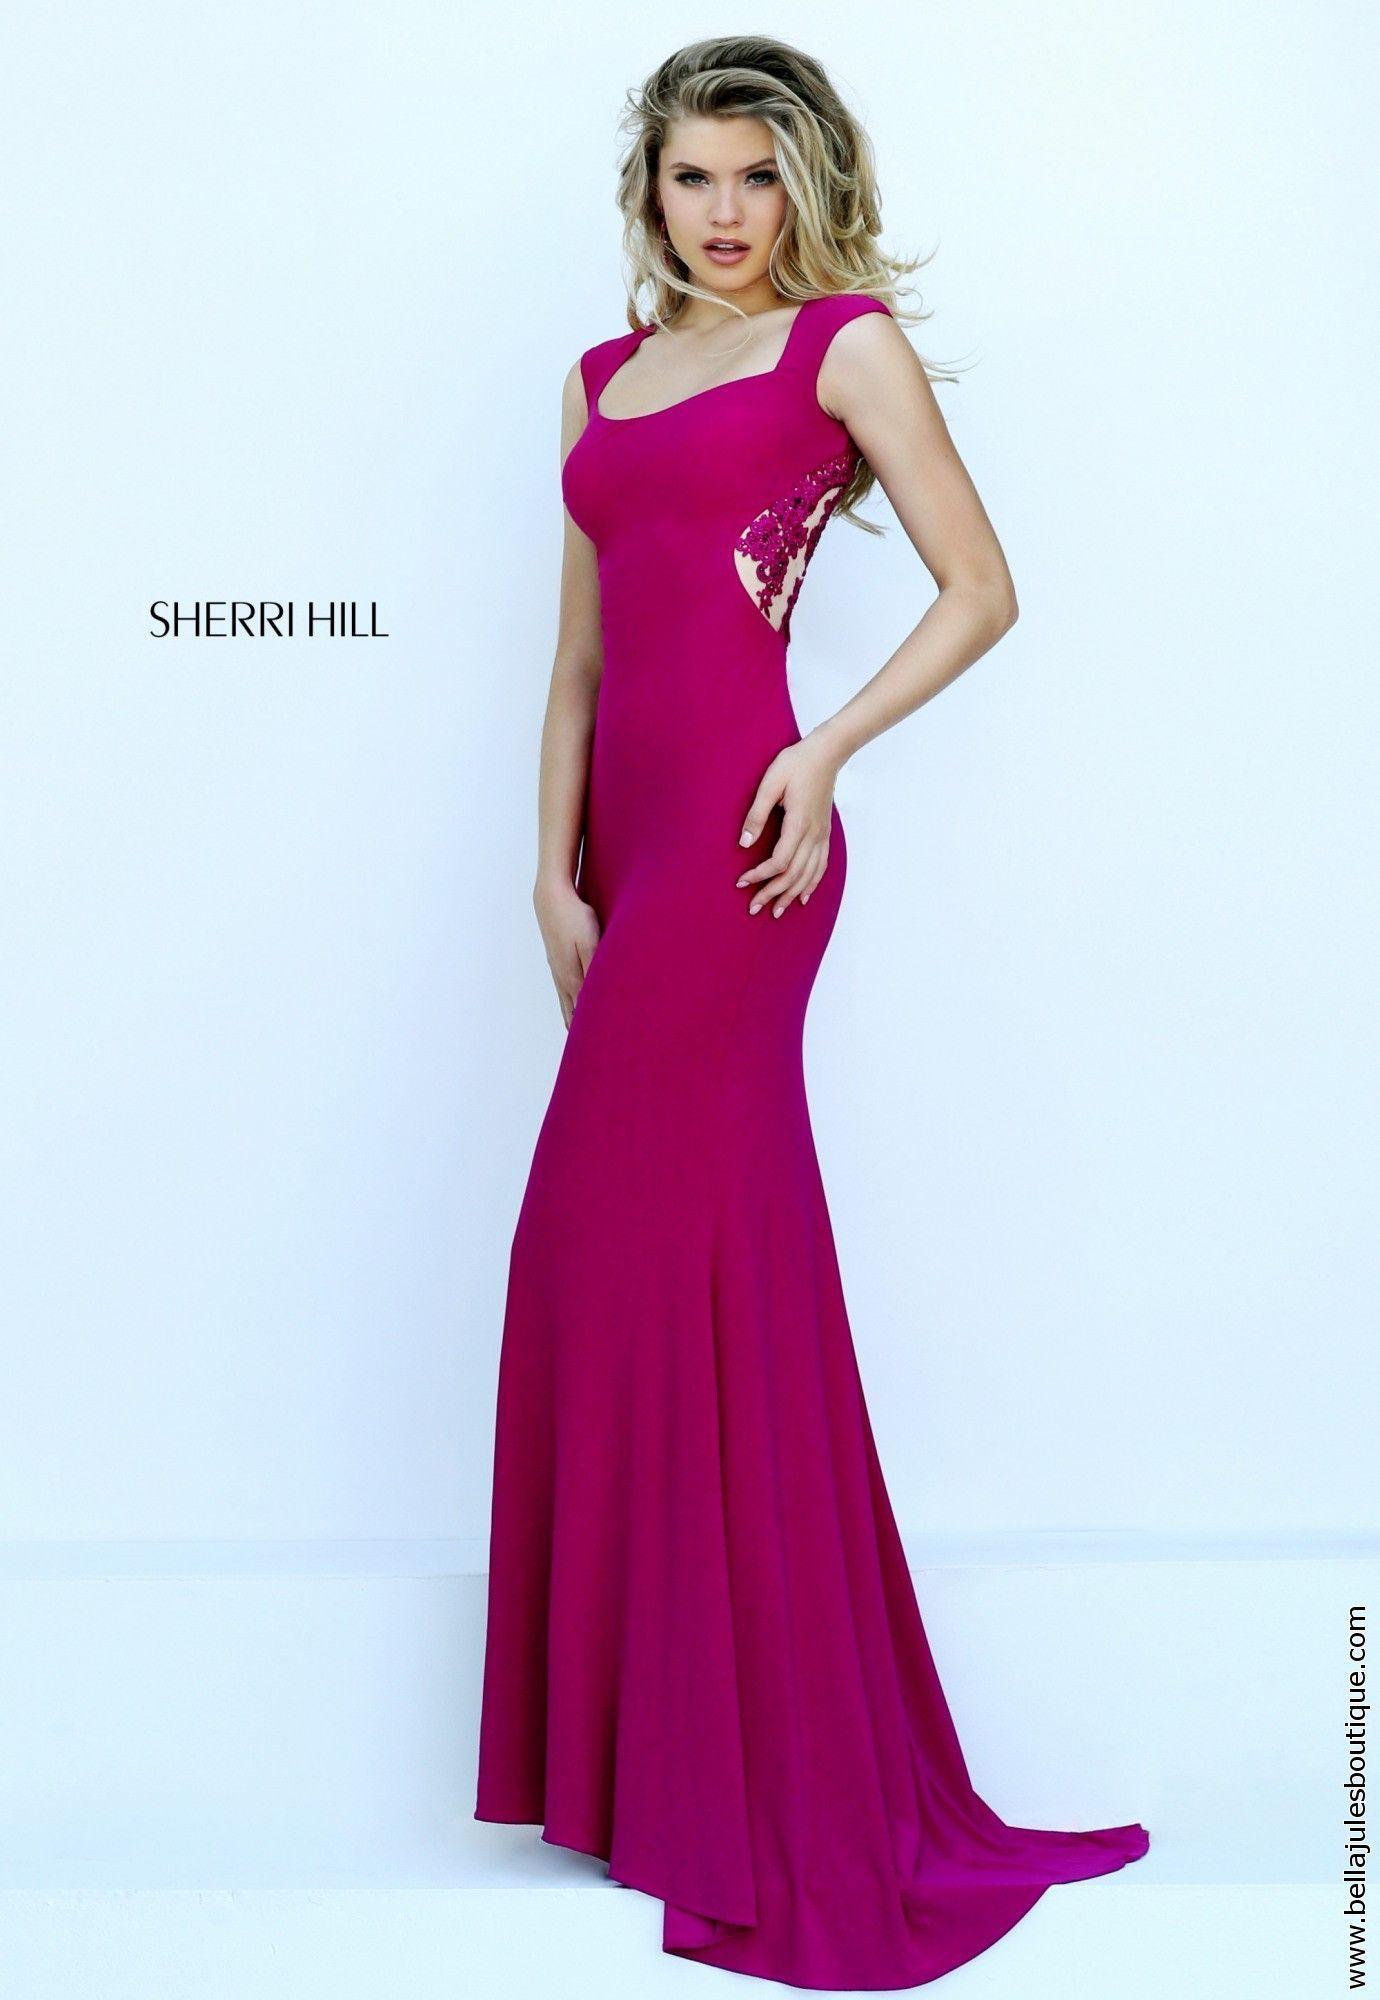 Sherri Hill prom dress style 50286 | Dresses | Pinterest